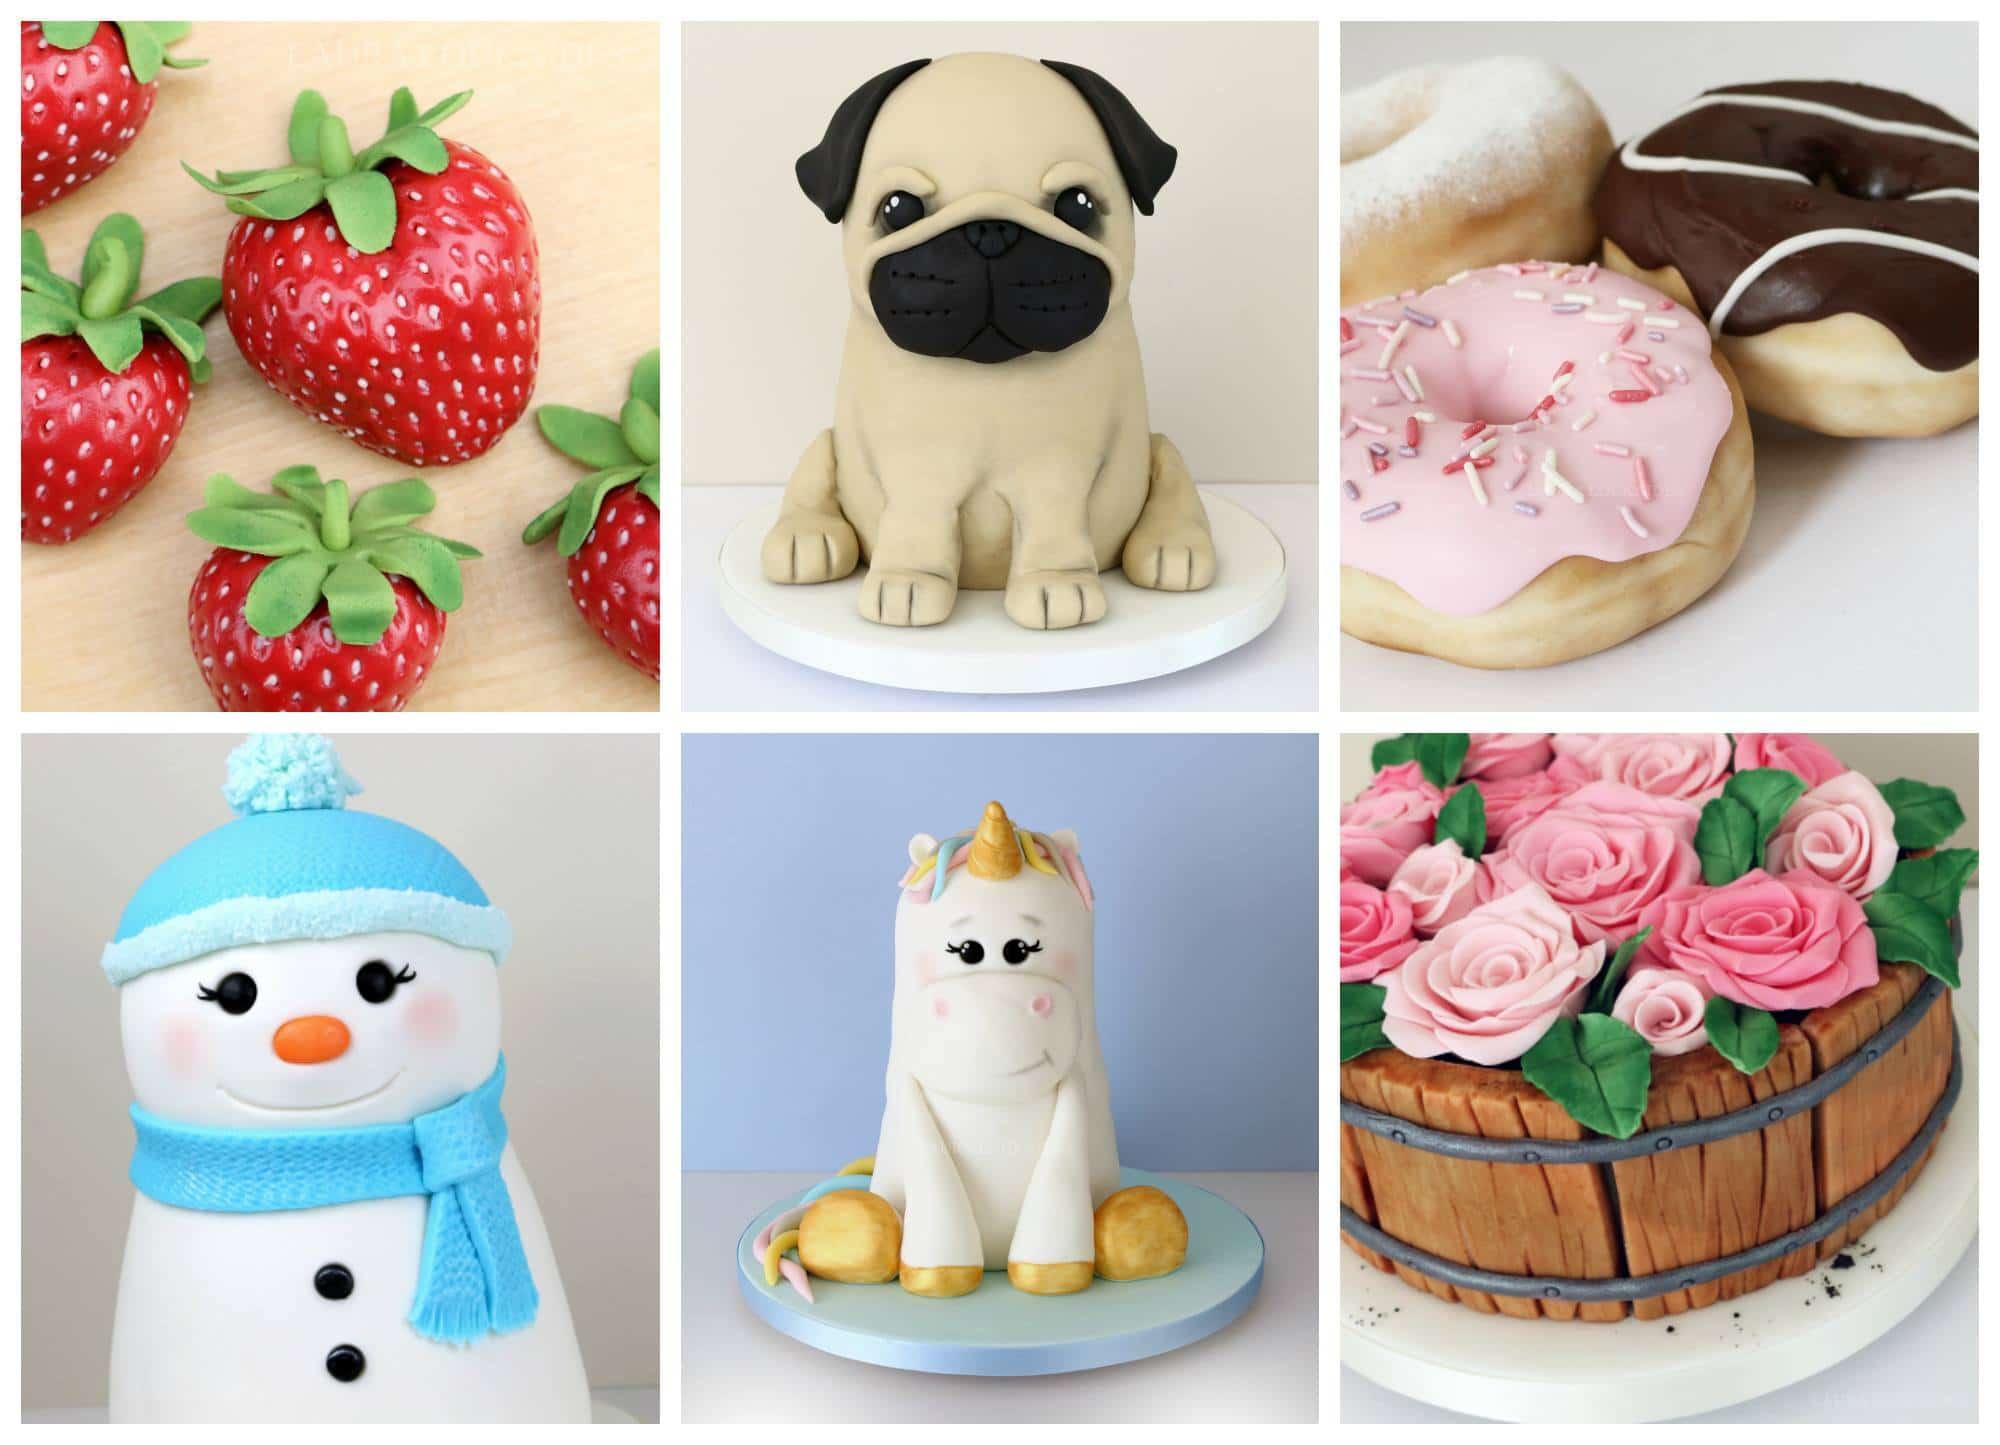 Os bolos premiados da Laura Loukaides 7